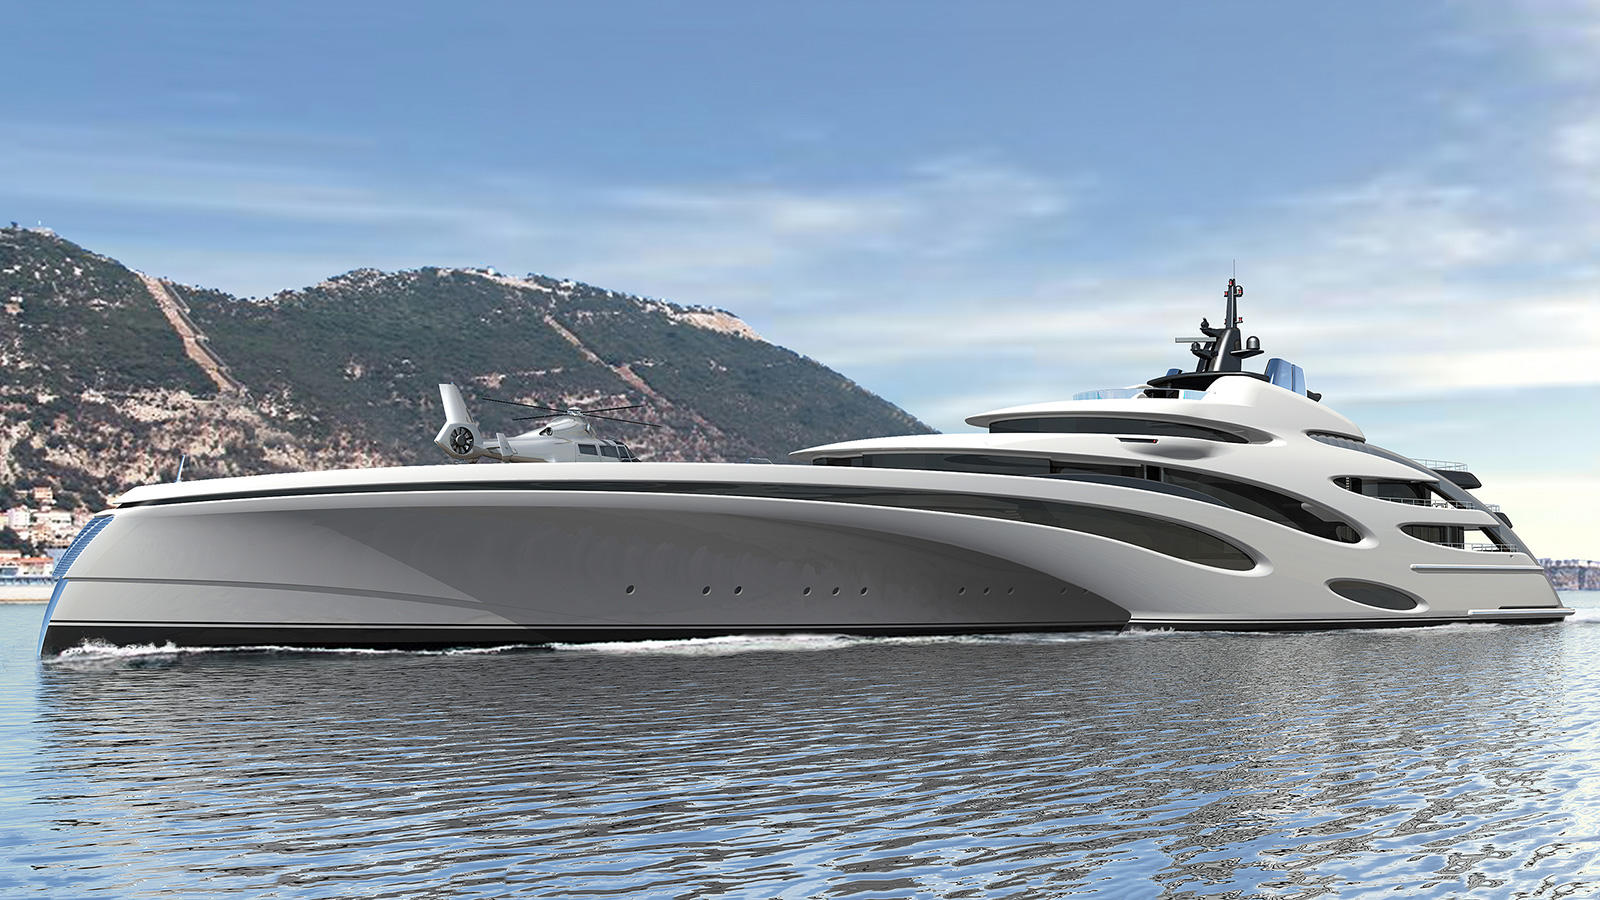 120m Eco Yachts trimaran concept revealed - Yacht Harbour